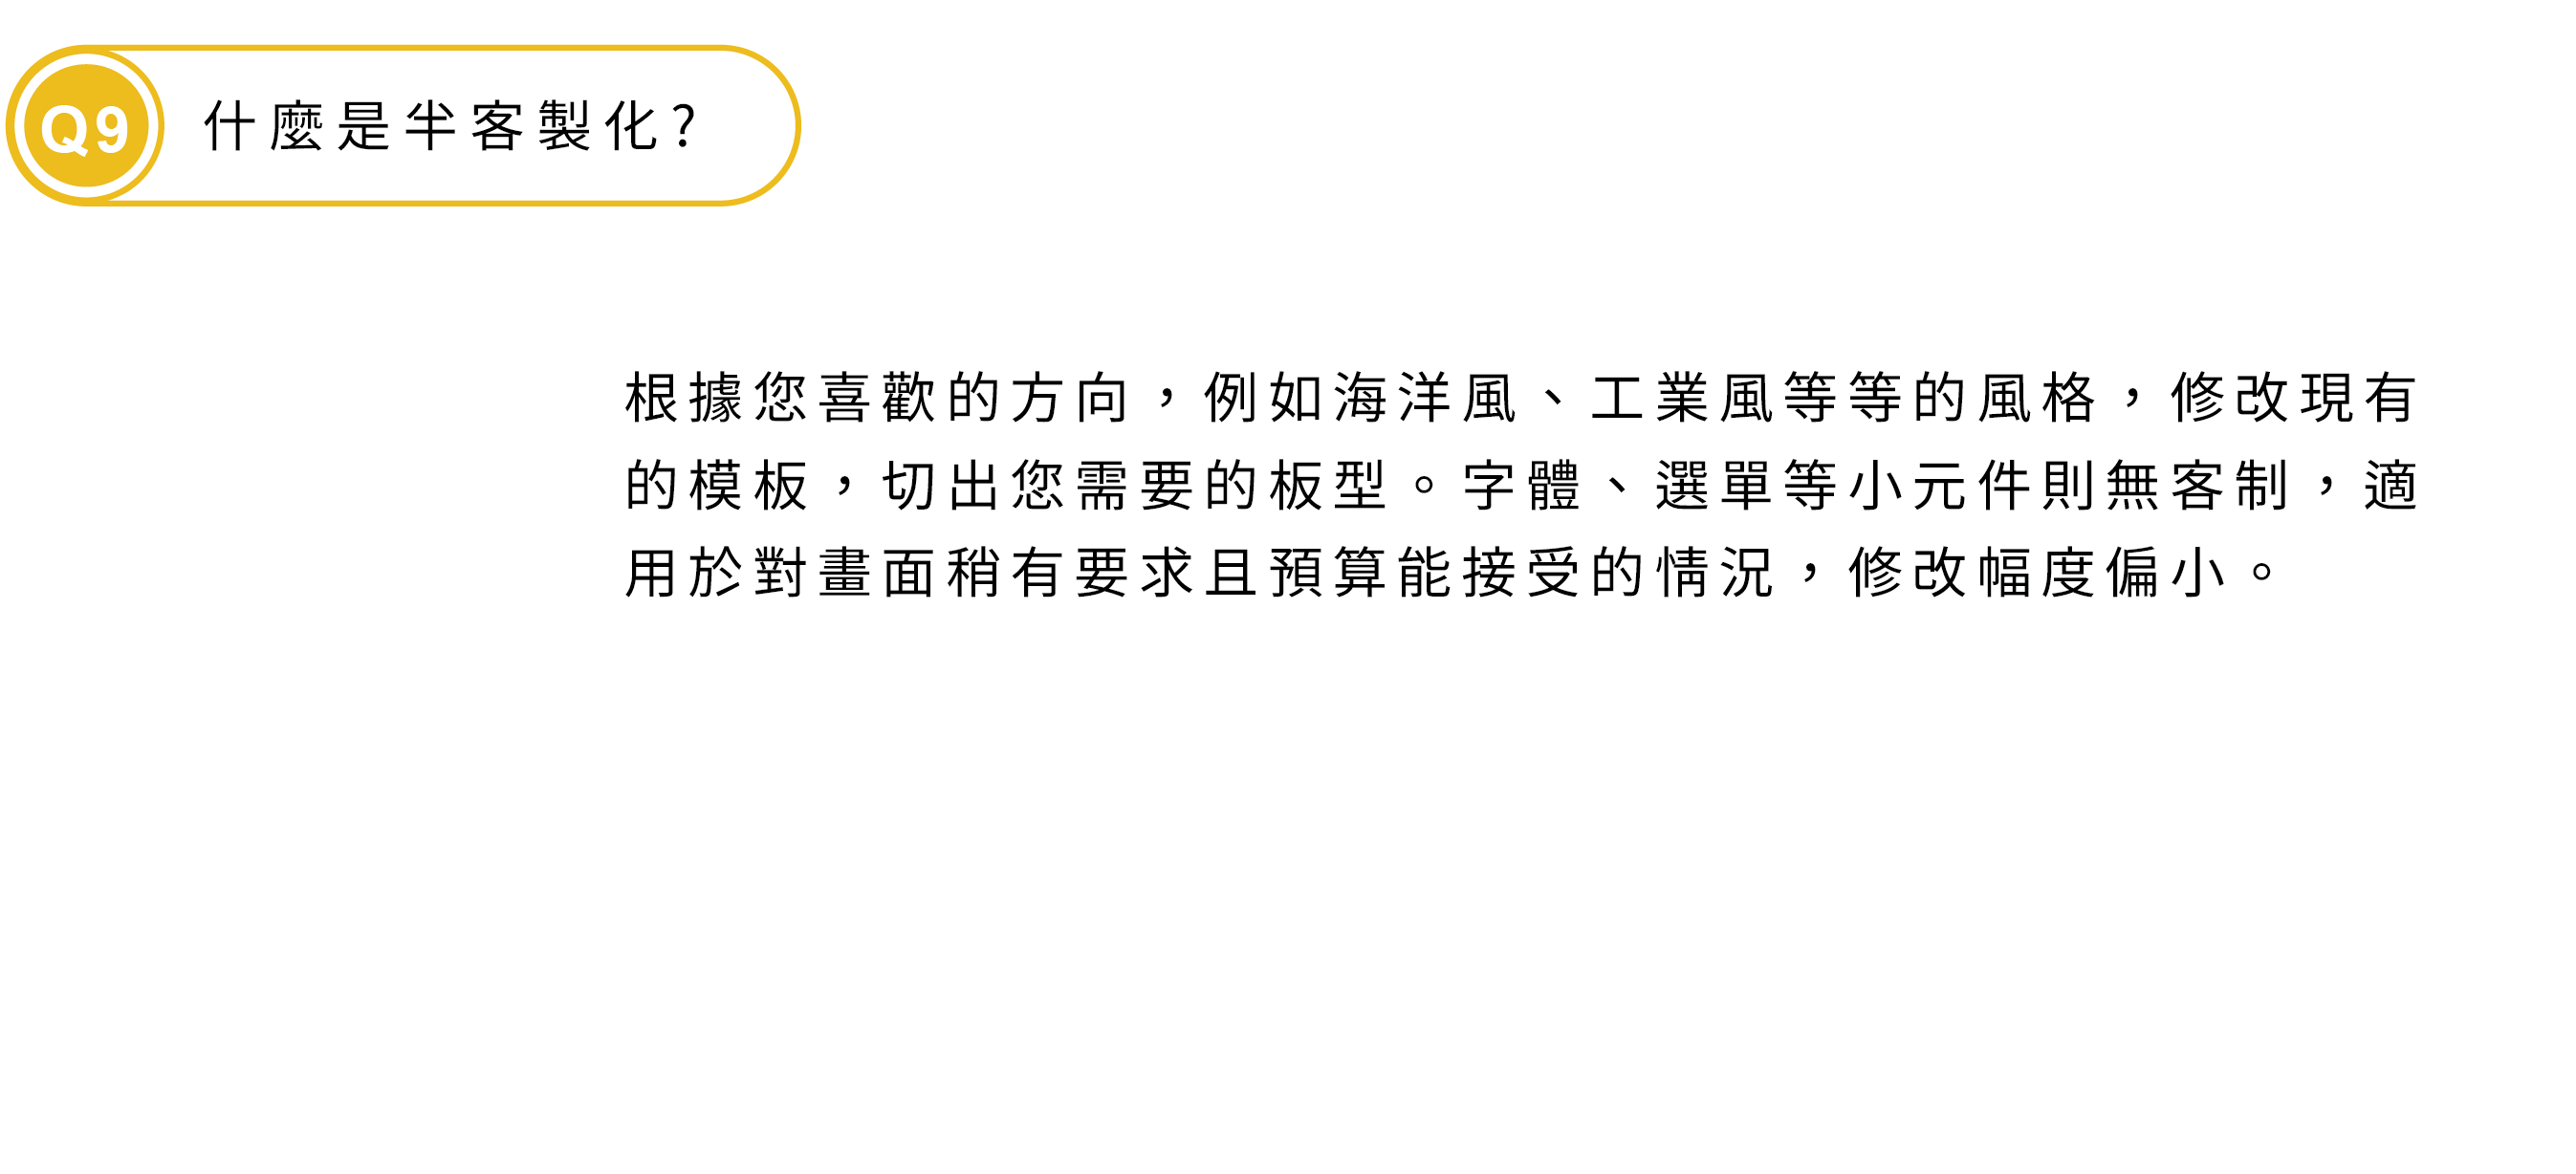 Q9-12